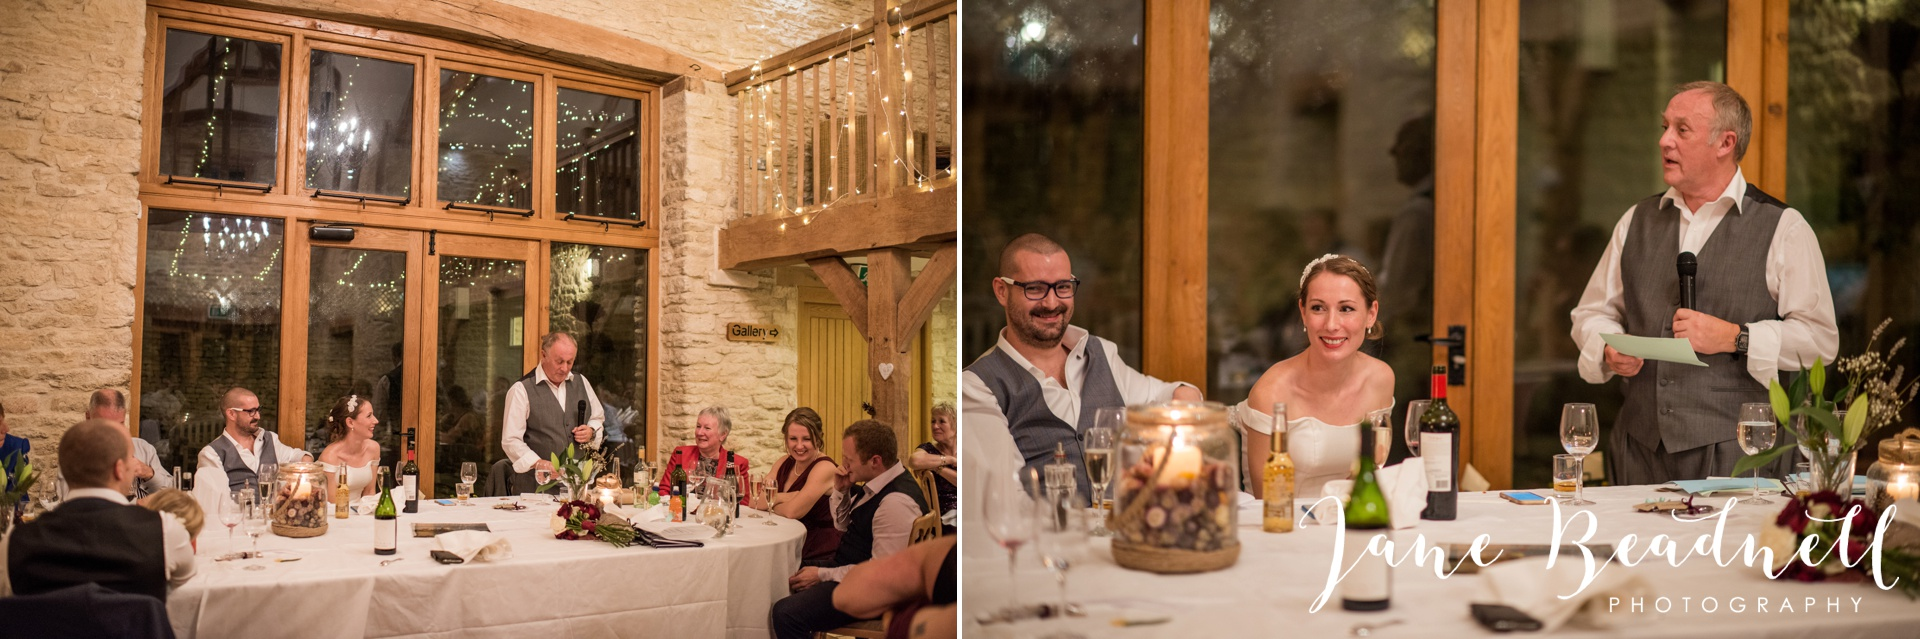 The Kingcote Barn Bristol Yorkshire and destination wedding photographer Jane Beadnell Photography_0079